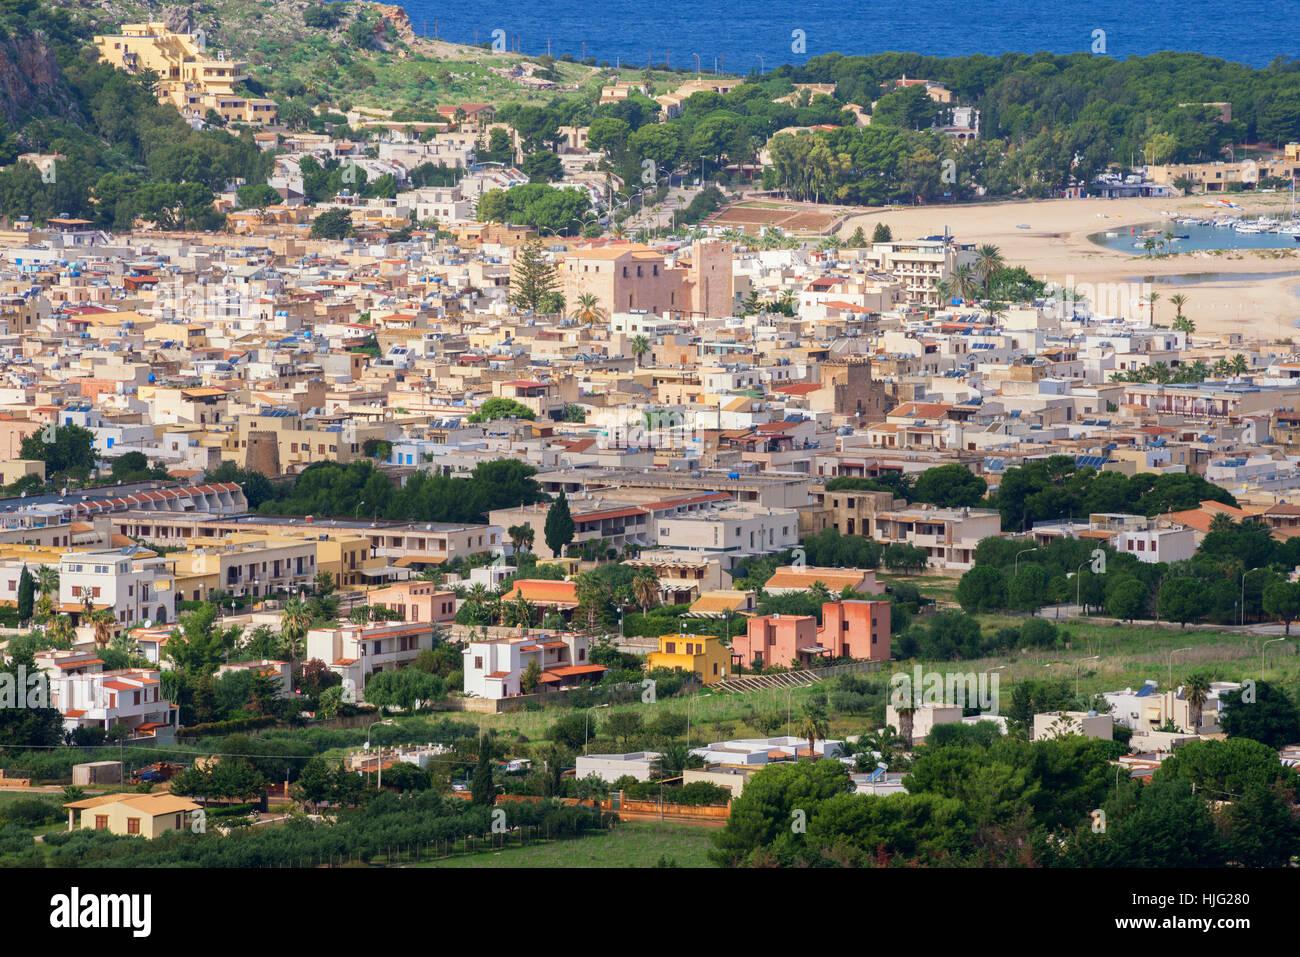 Vista de San Vito Lo capo, Sicilia, Italia Imagen De Stock